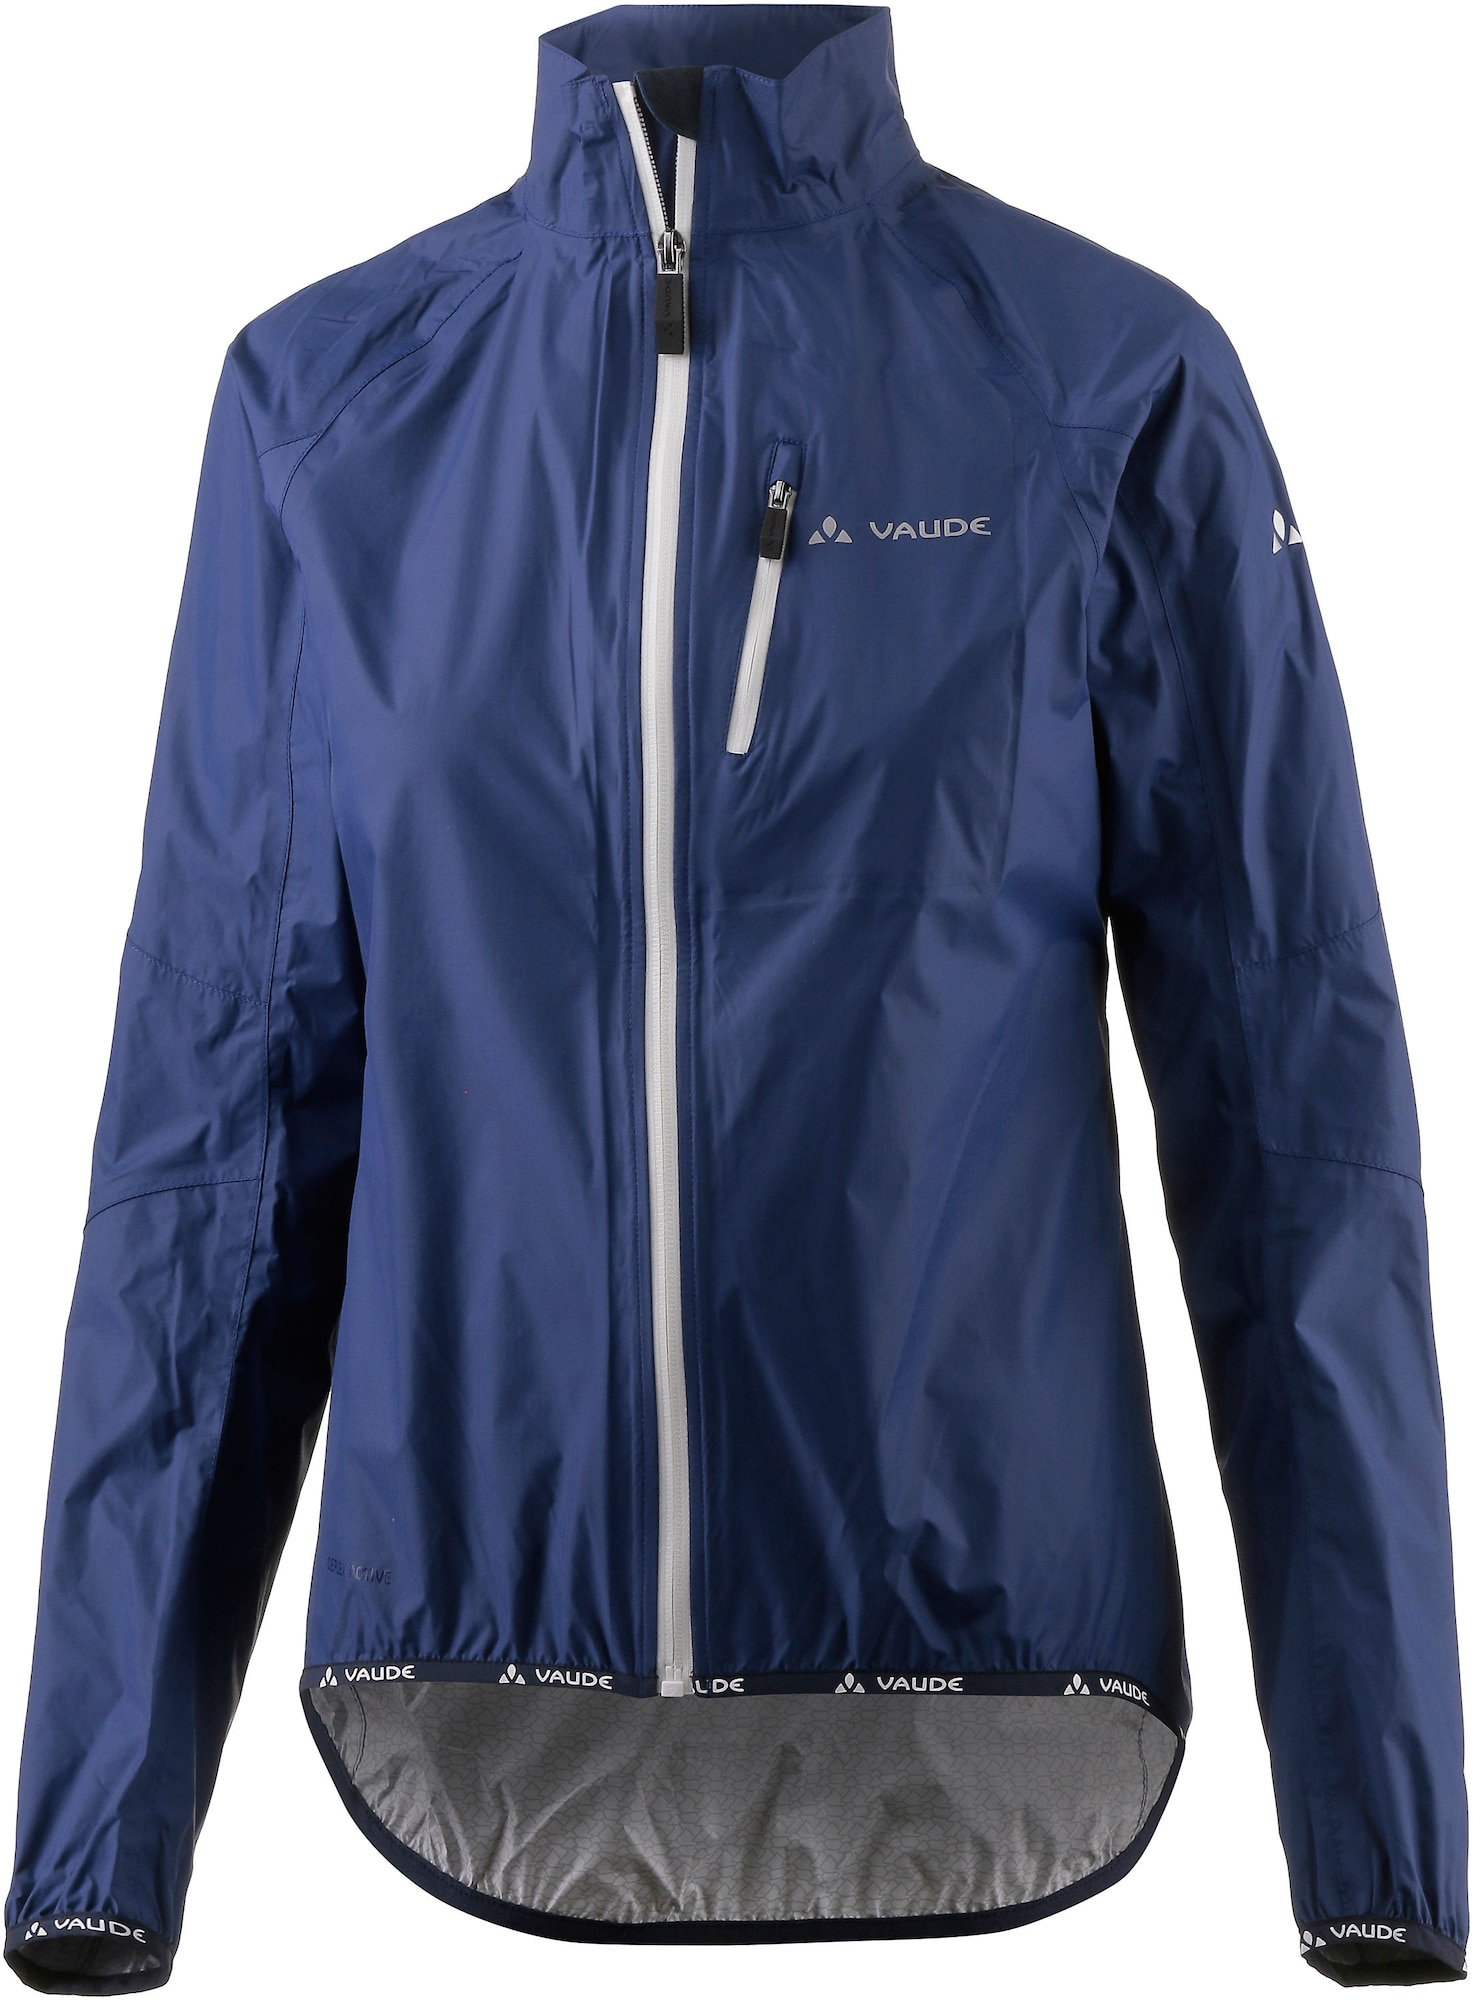 'Drop III' Fahrradjacke   Sportbekleidung > Sportjacken > Fahrradjacken   Blau   Vaude